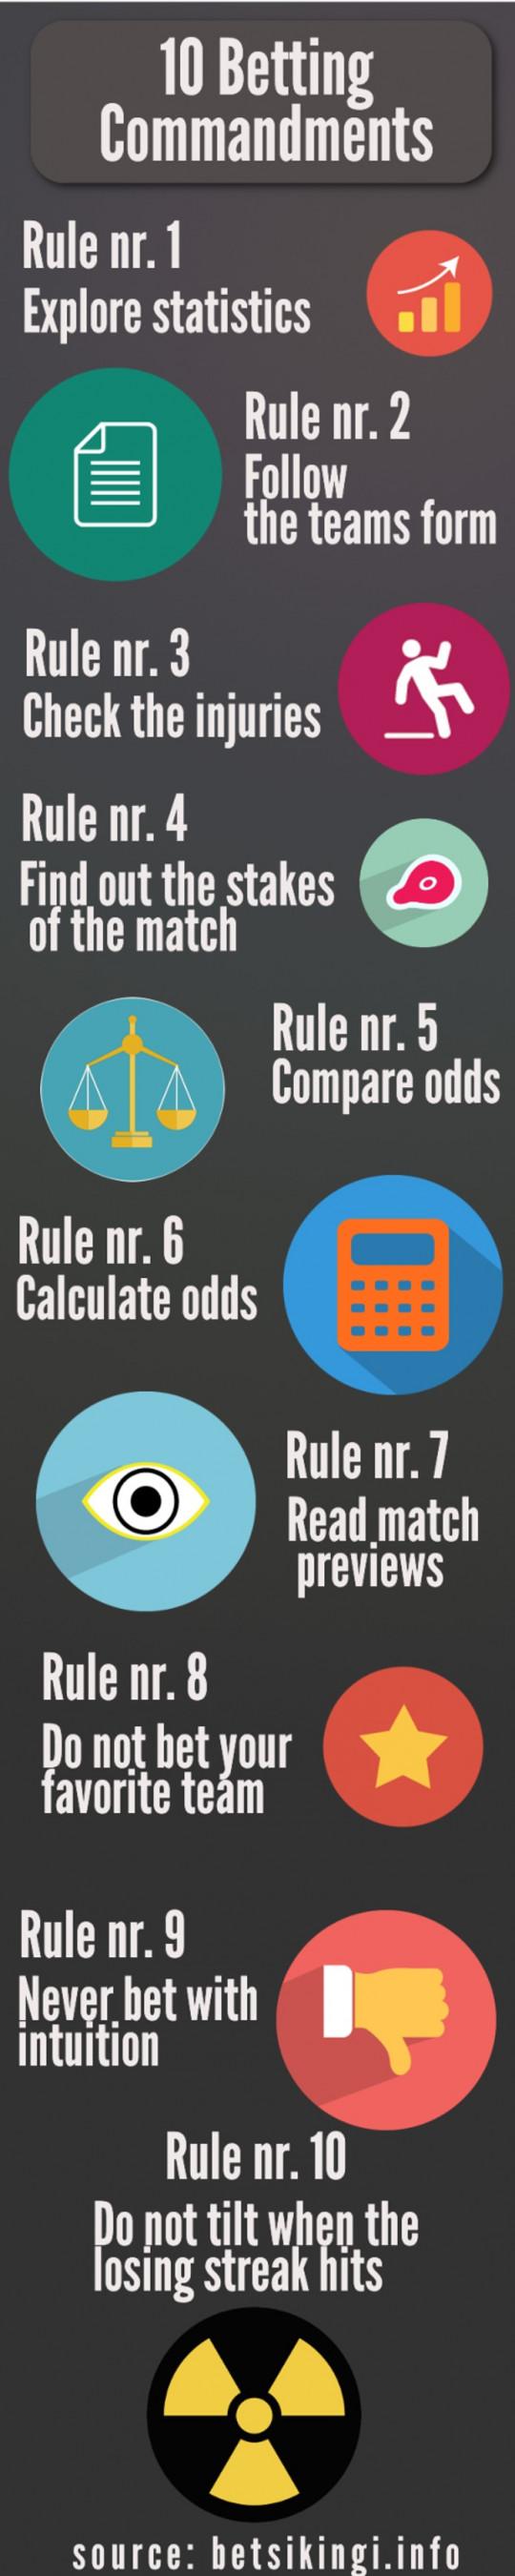 Ten sports betting commandments